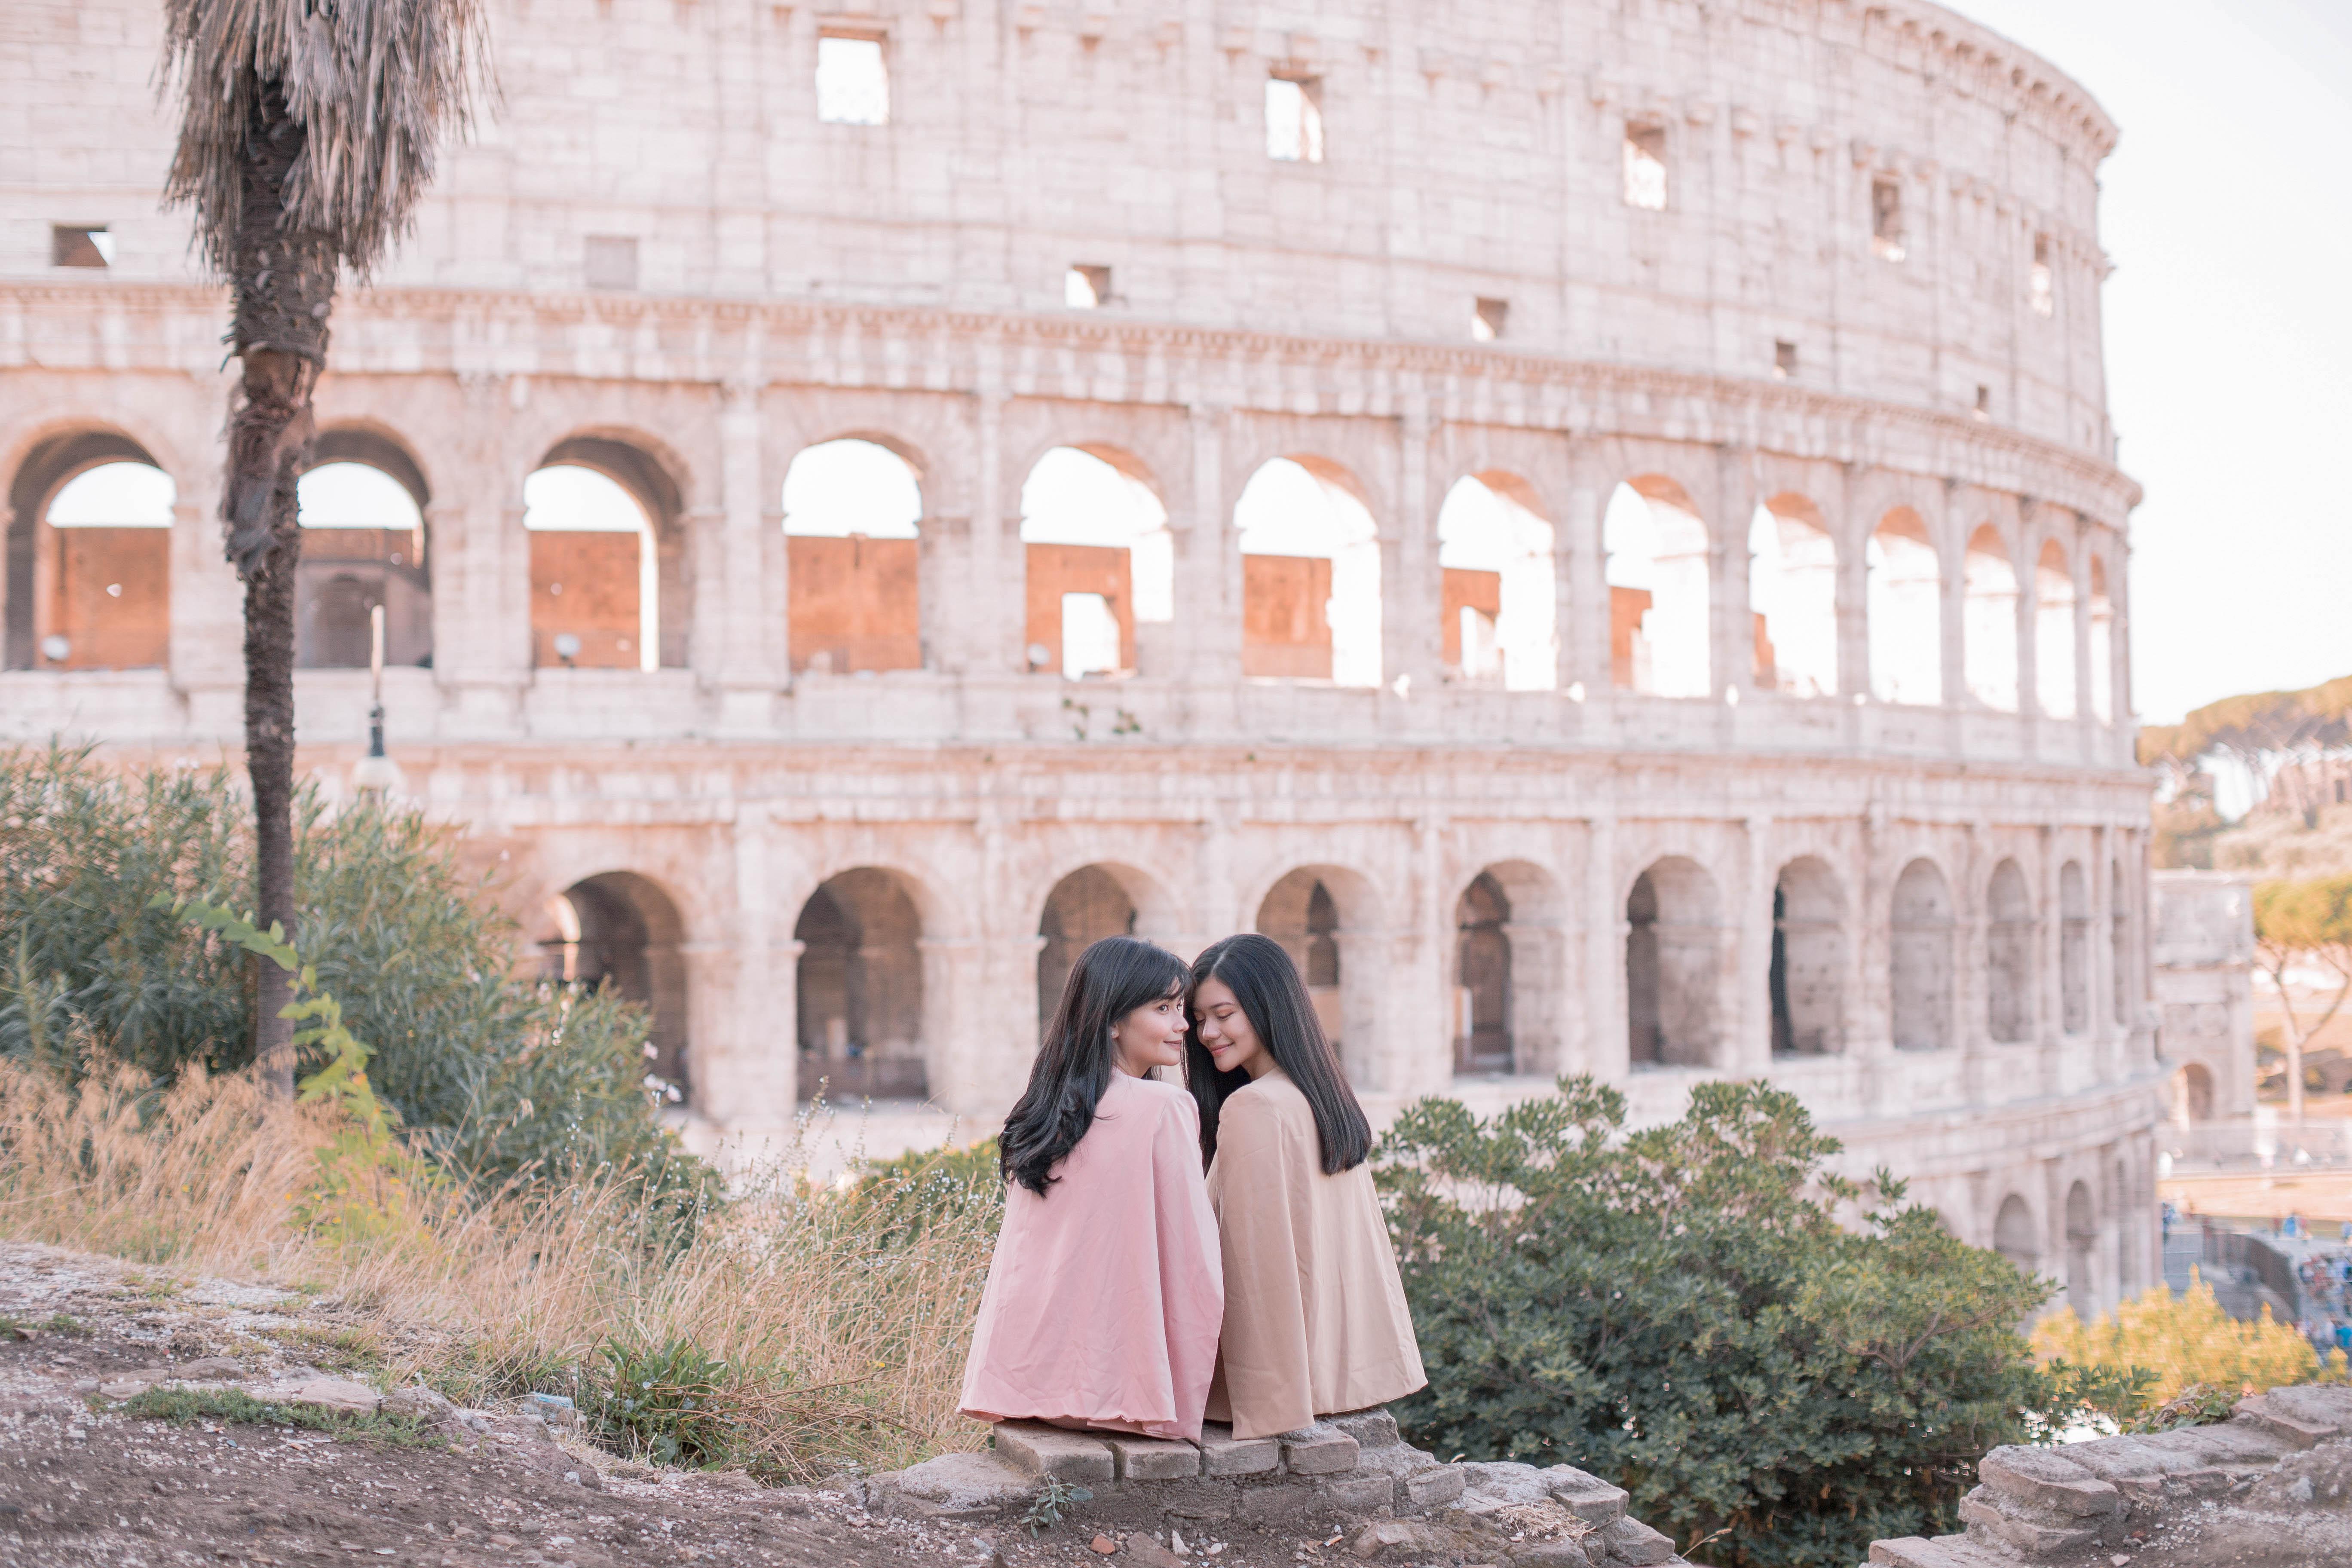 vernica_enciso-rome-s1_26 copy